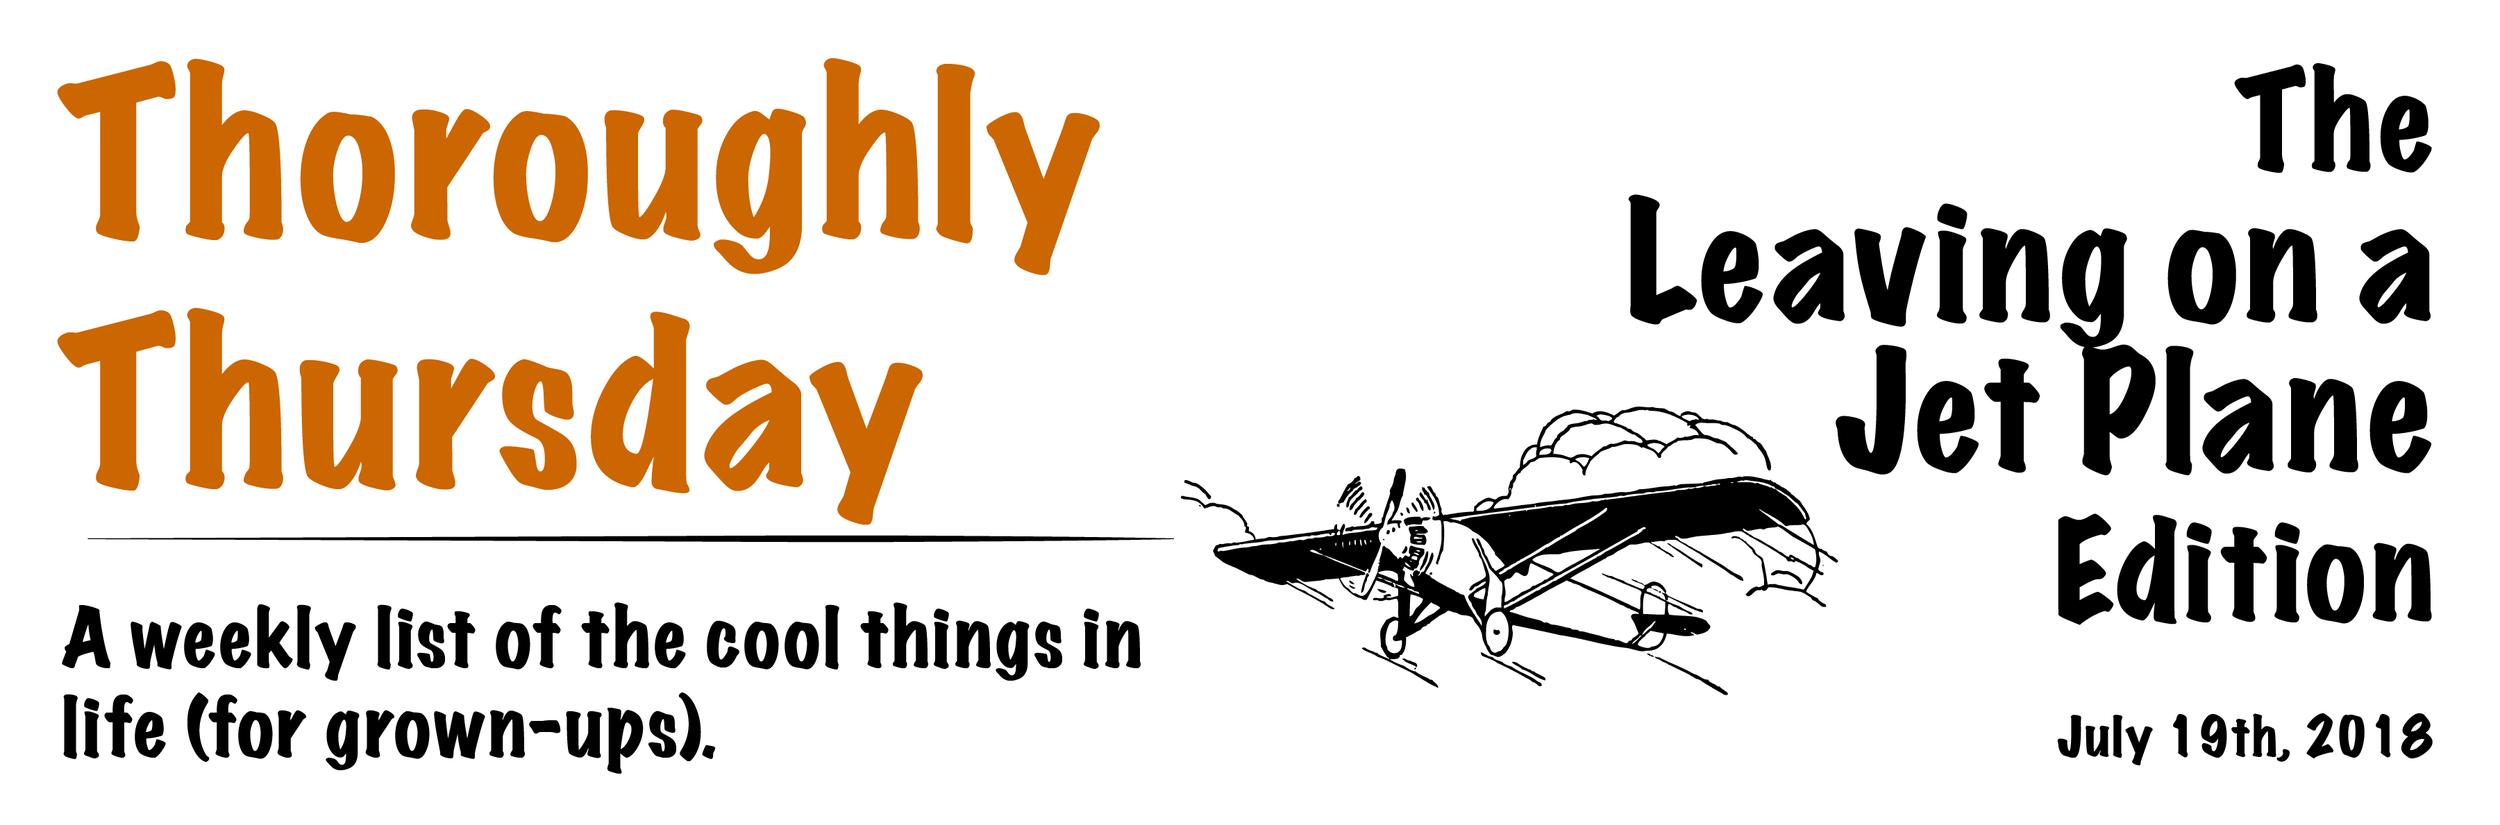 TT-Logo-leavingonajetplane-SDM@3x.png